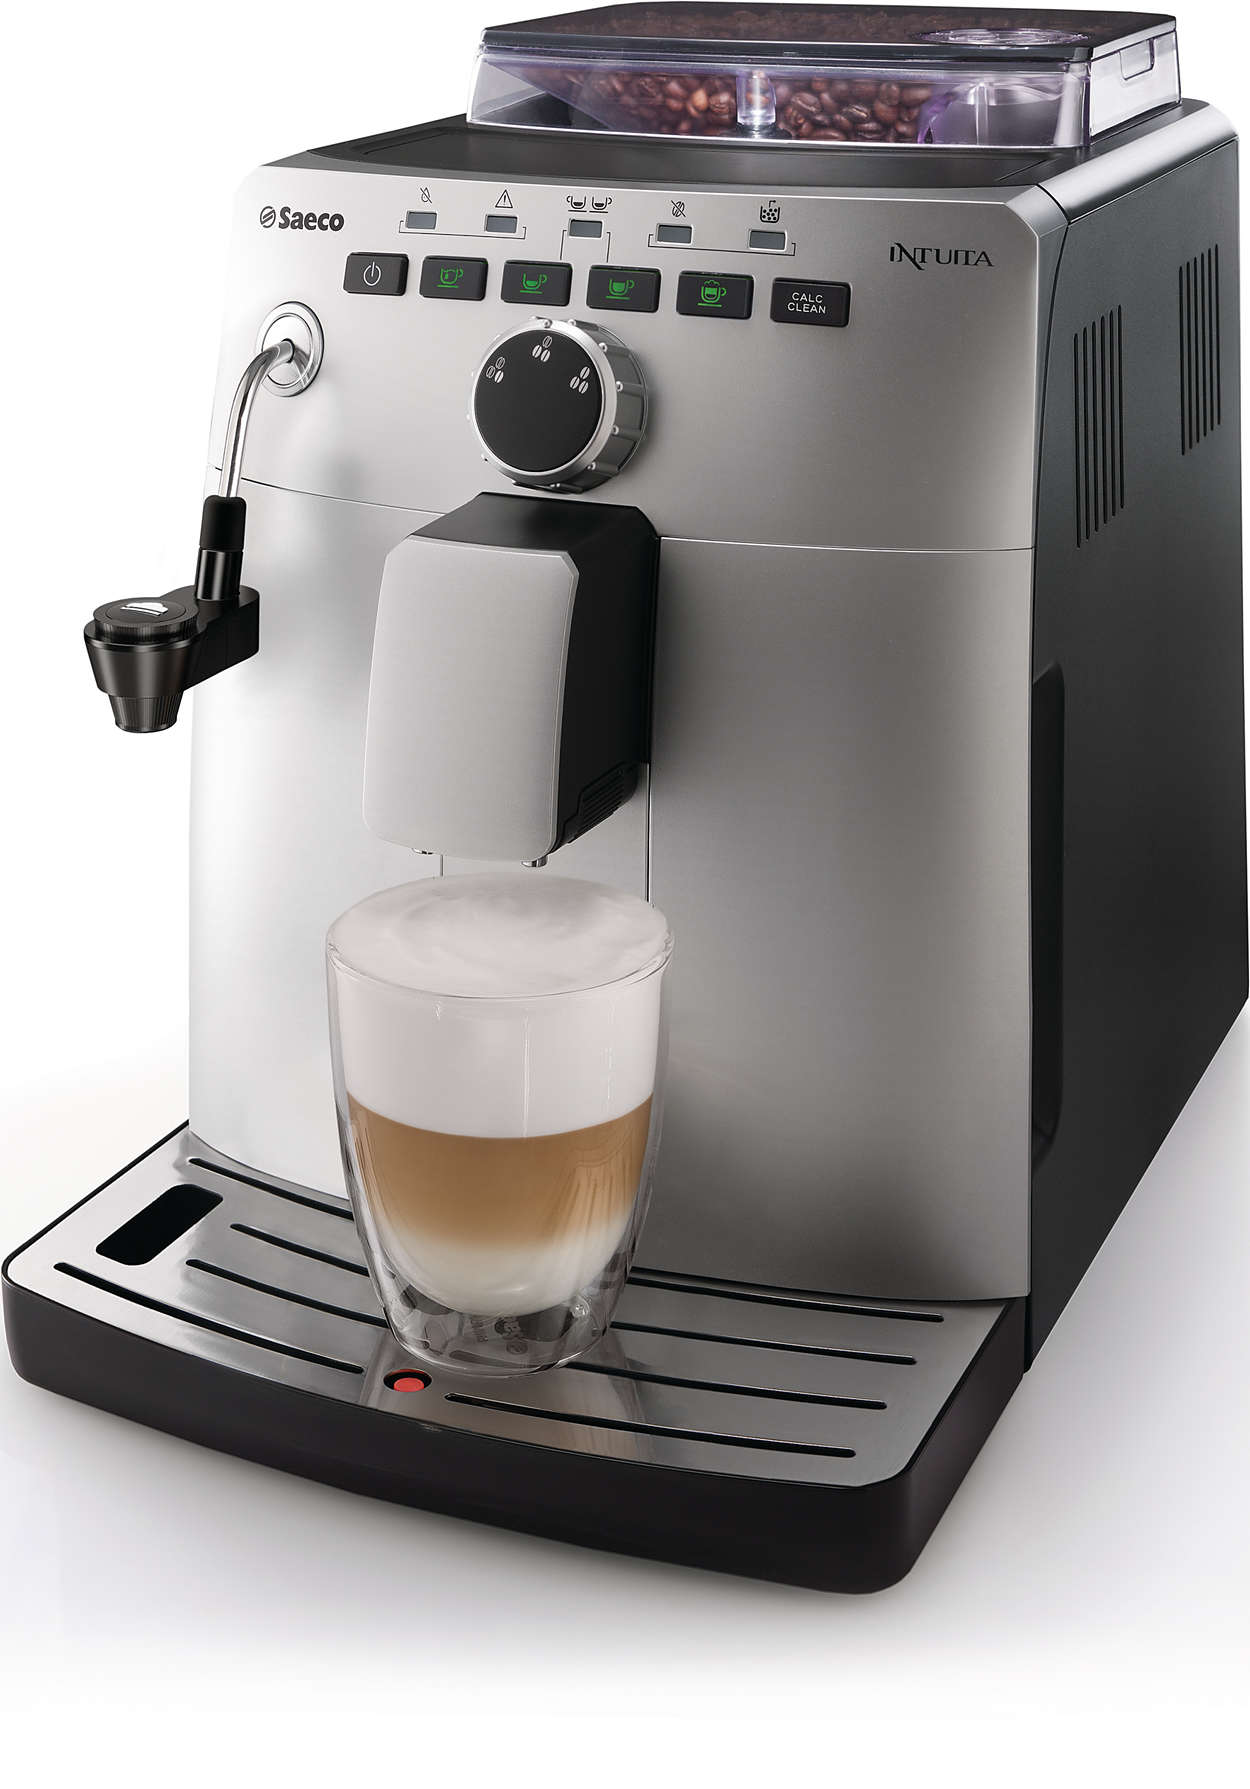 intuita machine espresso super automatique hd8750 81 saeco. Black Bedroom Furniture Sets. Home Design Ideas